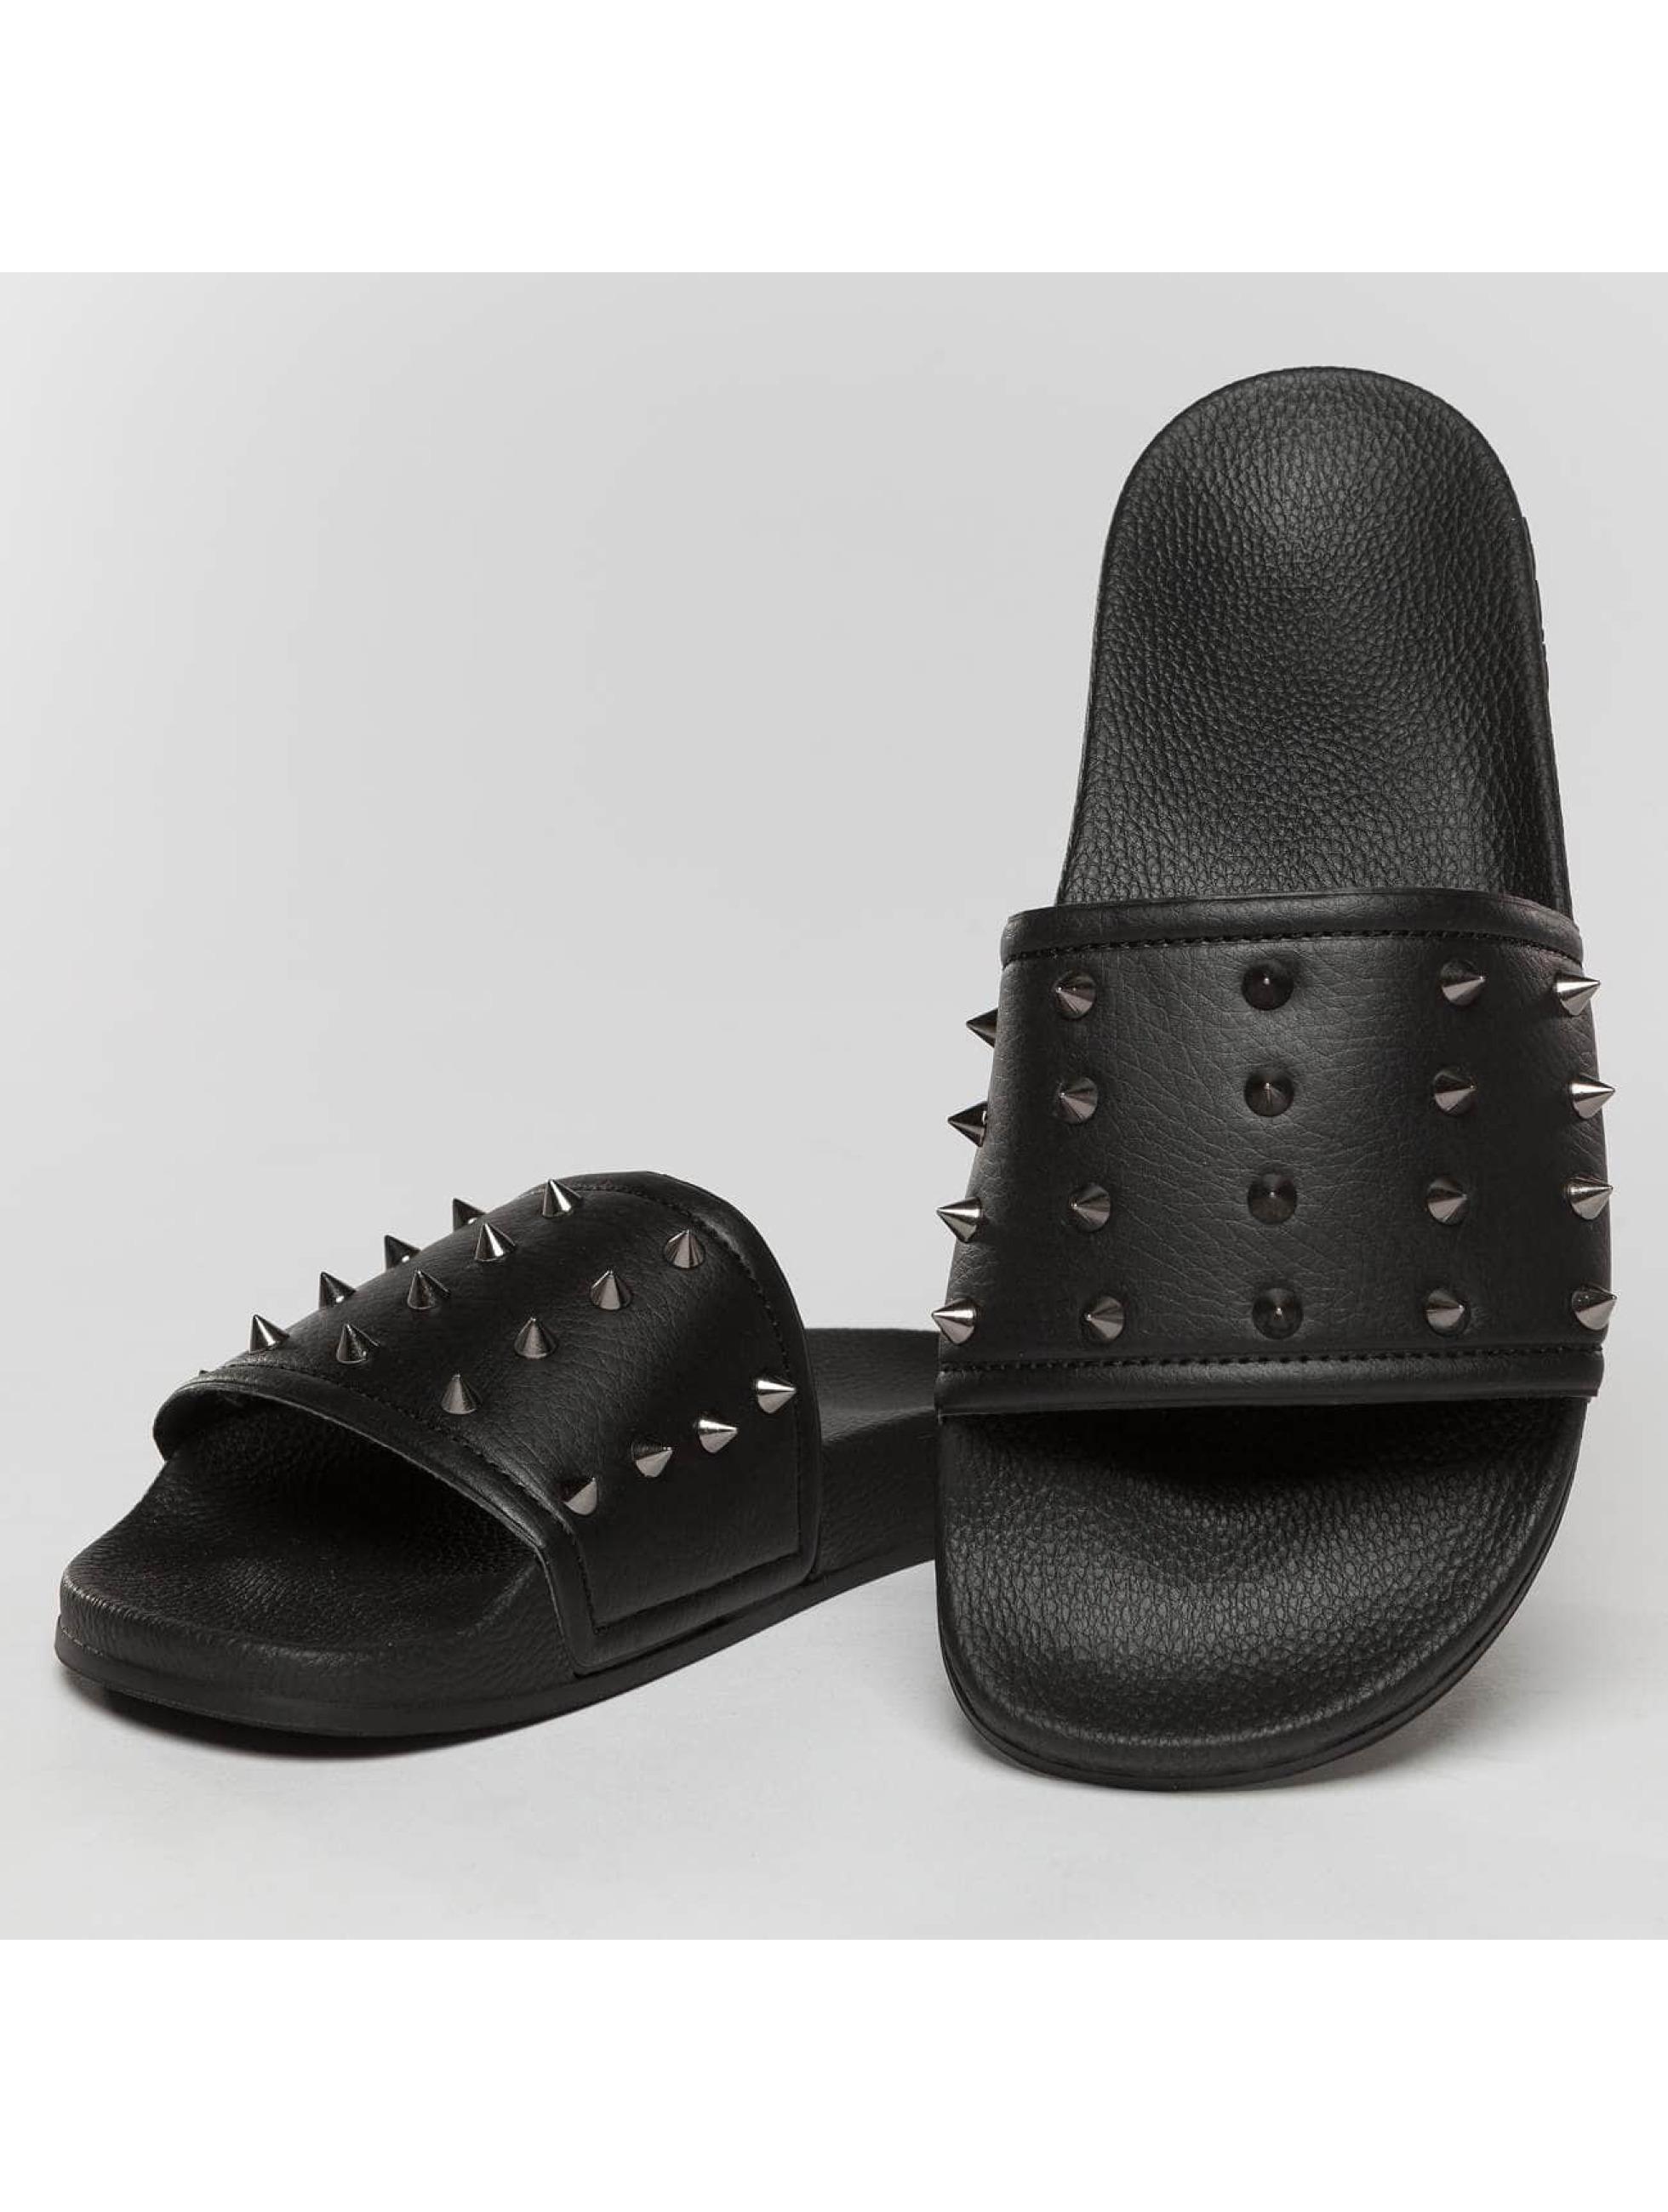 Slydes Sandals Nova black